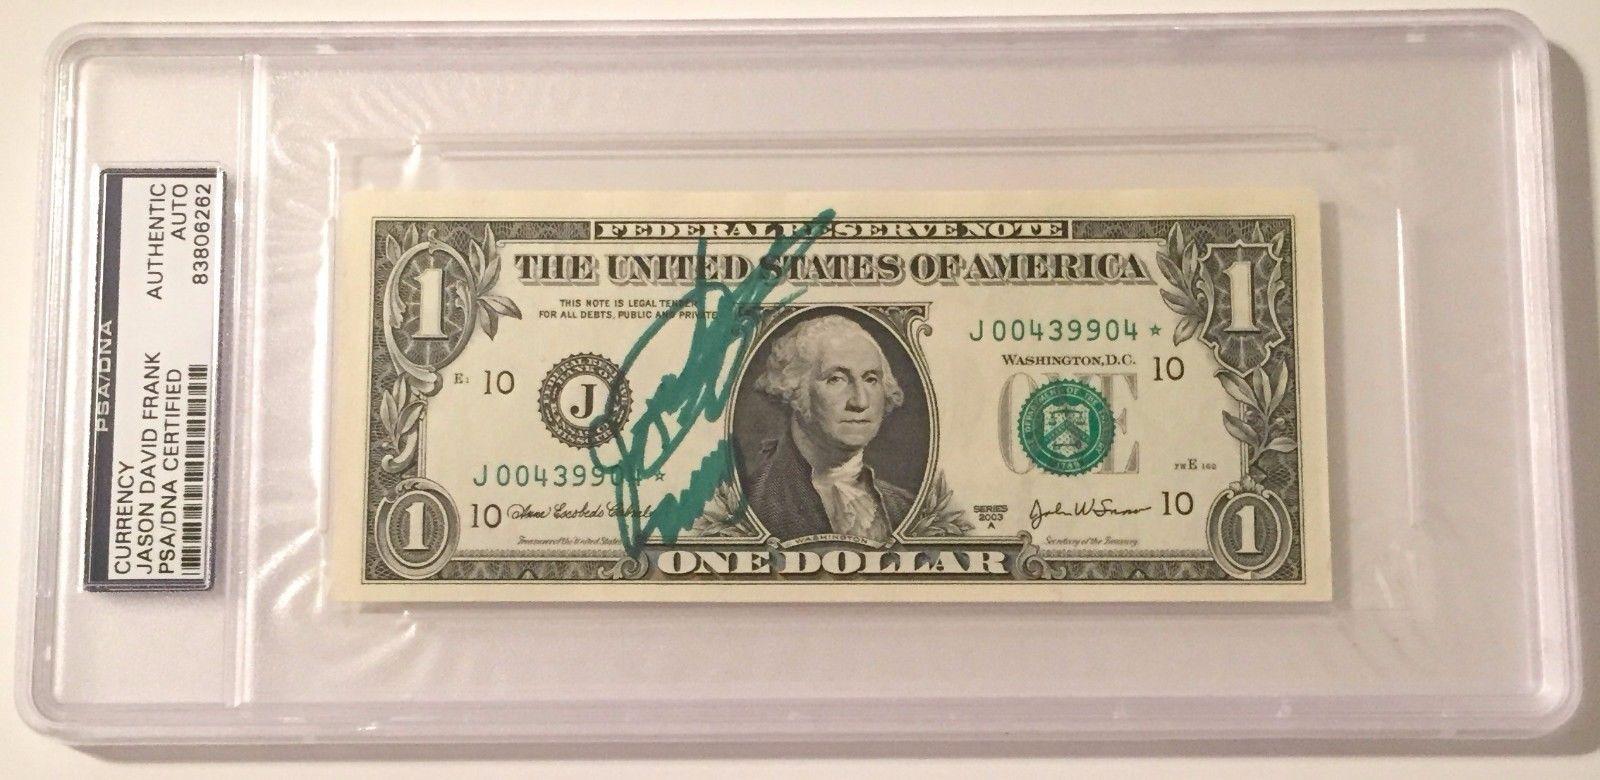 Jason David Frank Green Power Ranger Signed  1 00 Star Note Bill Psa  Dna Slabbed